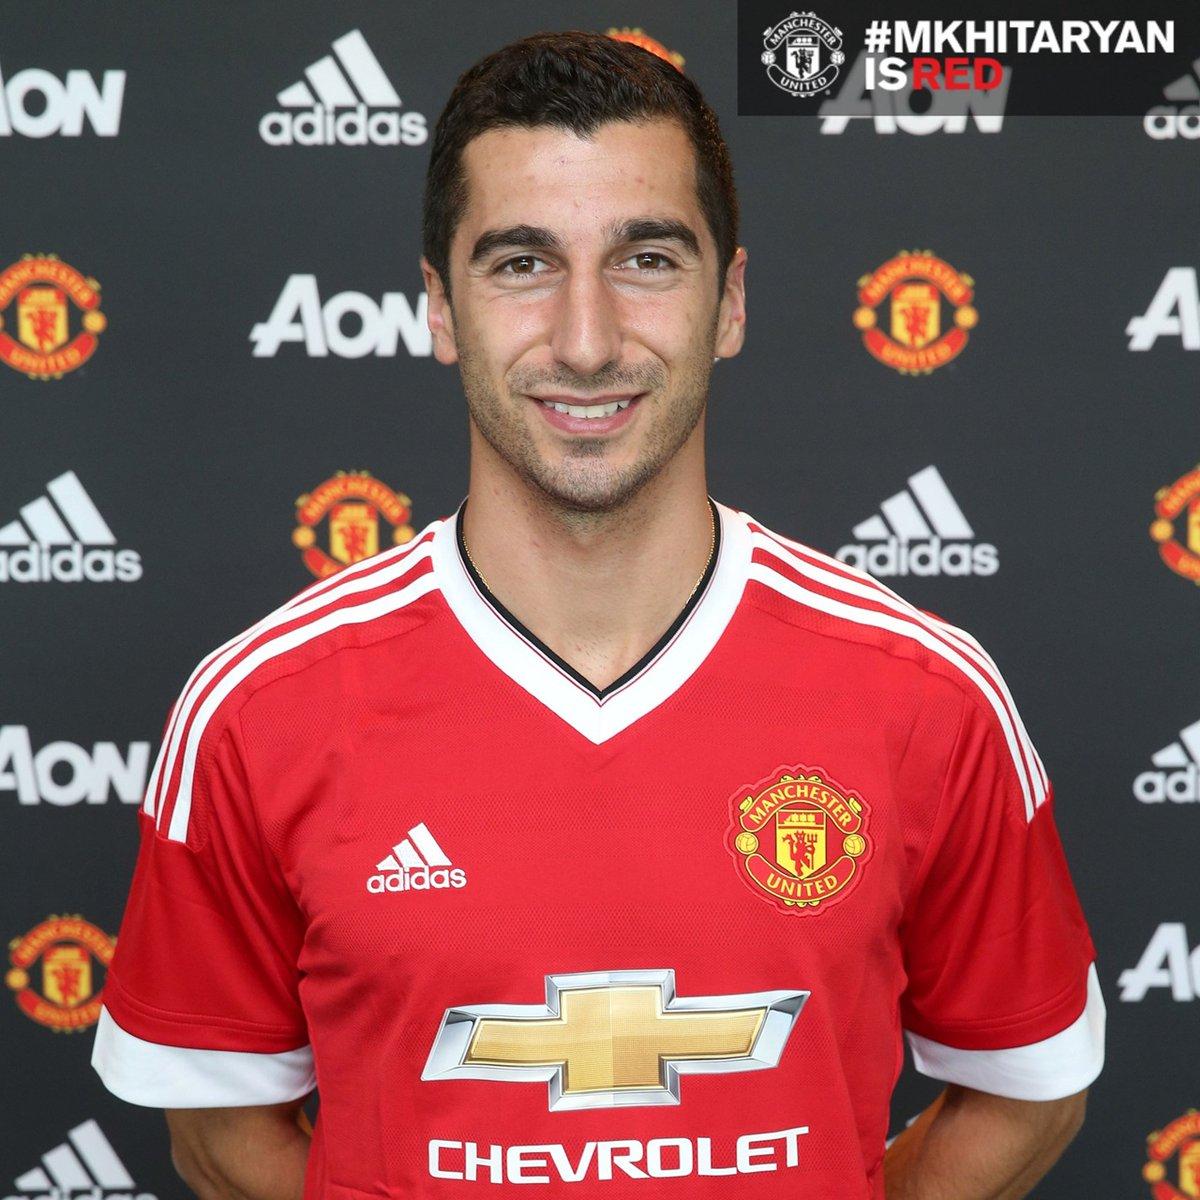 Man United Confirm Mkhitryan Signing